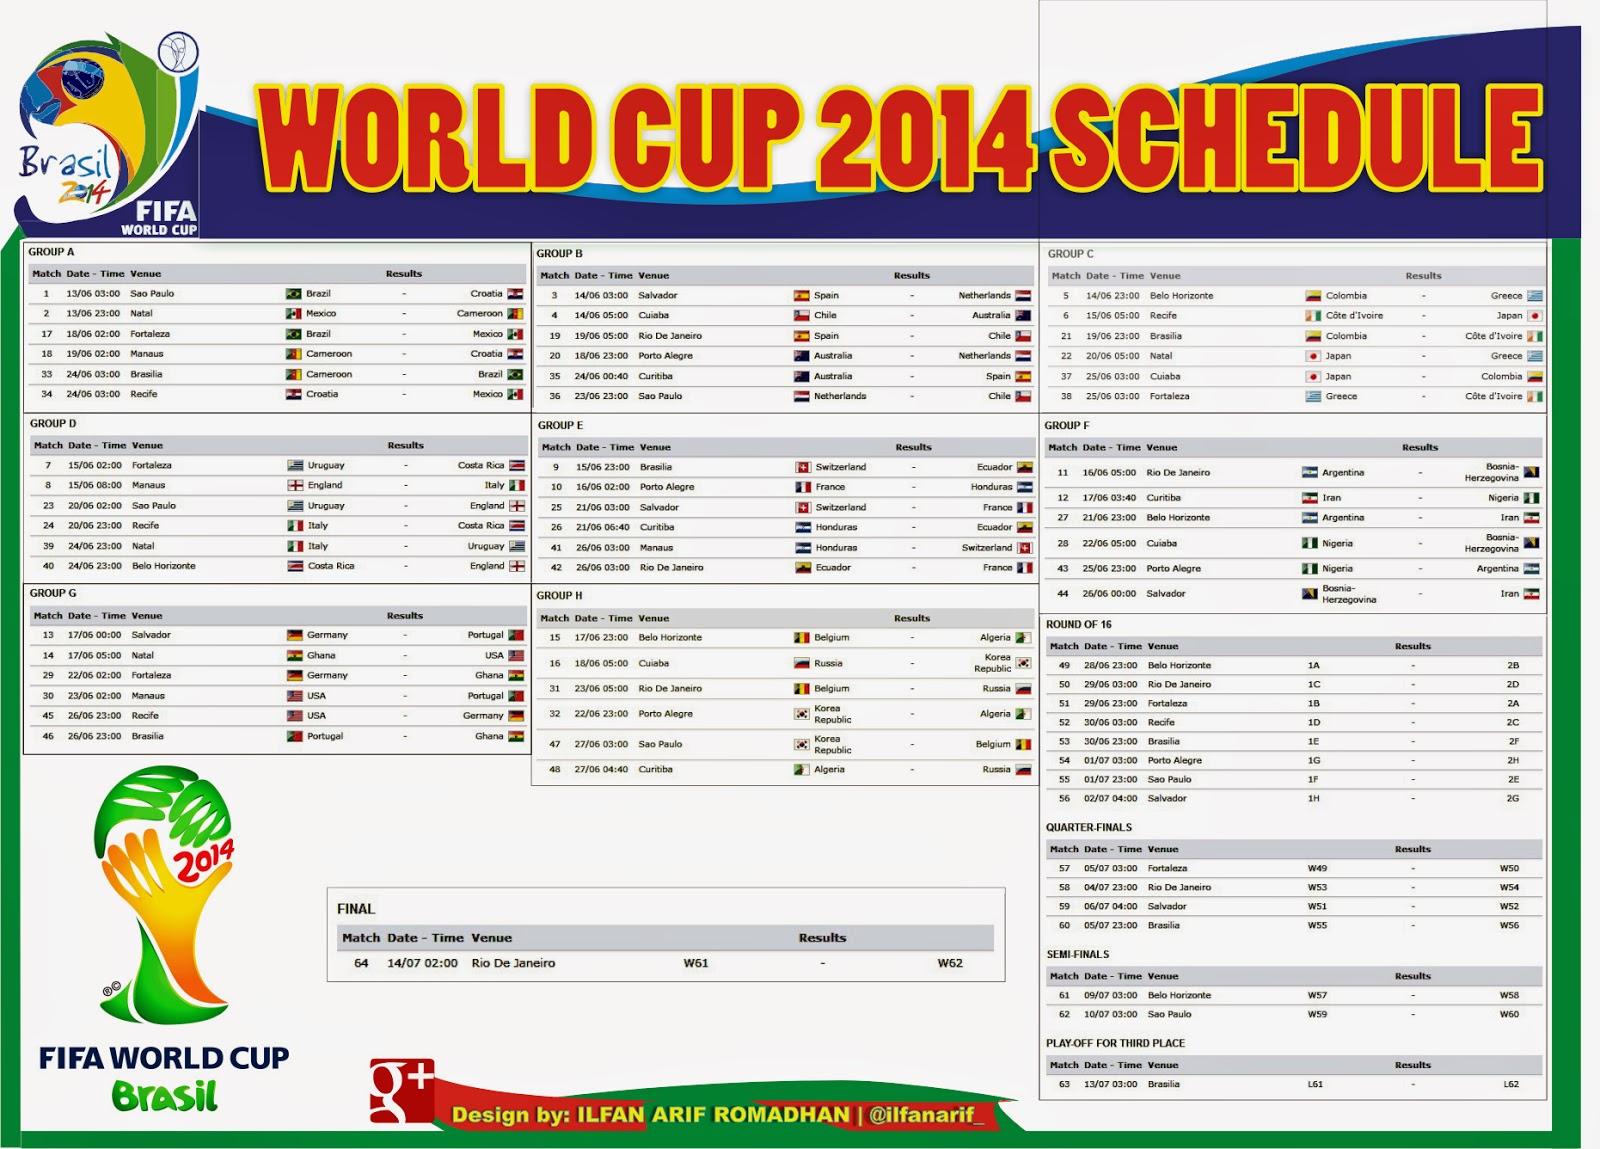 Download jadwal piala dunia 2014 excel.